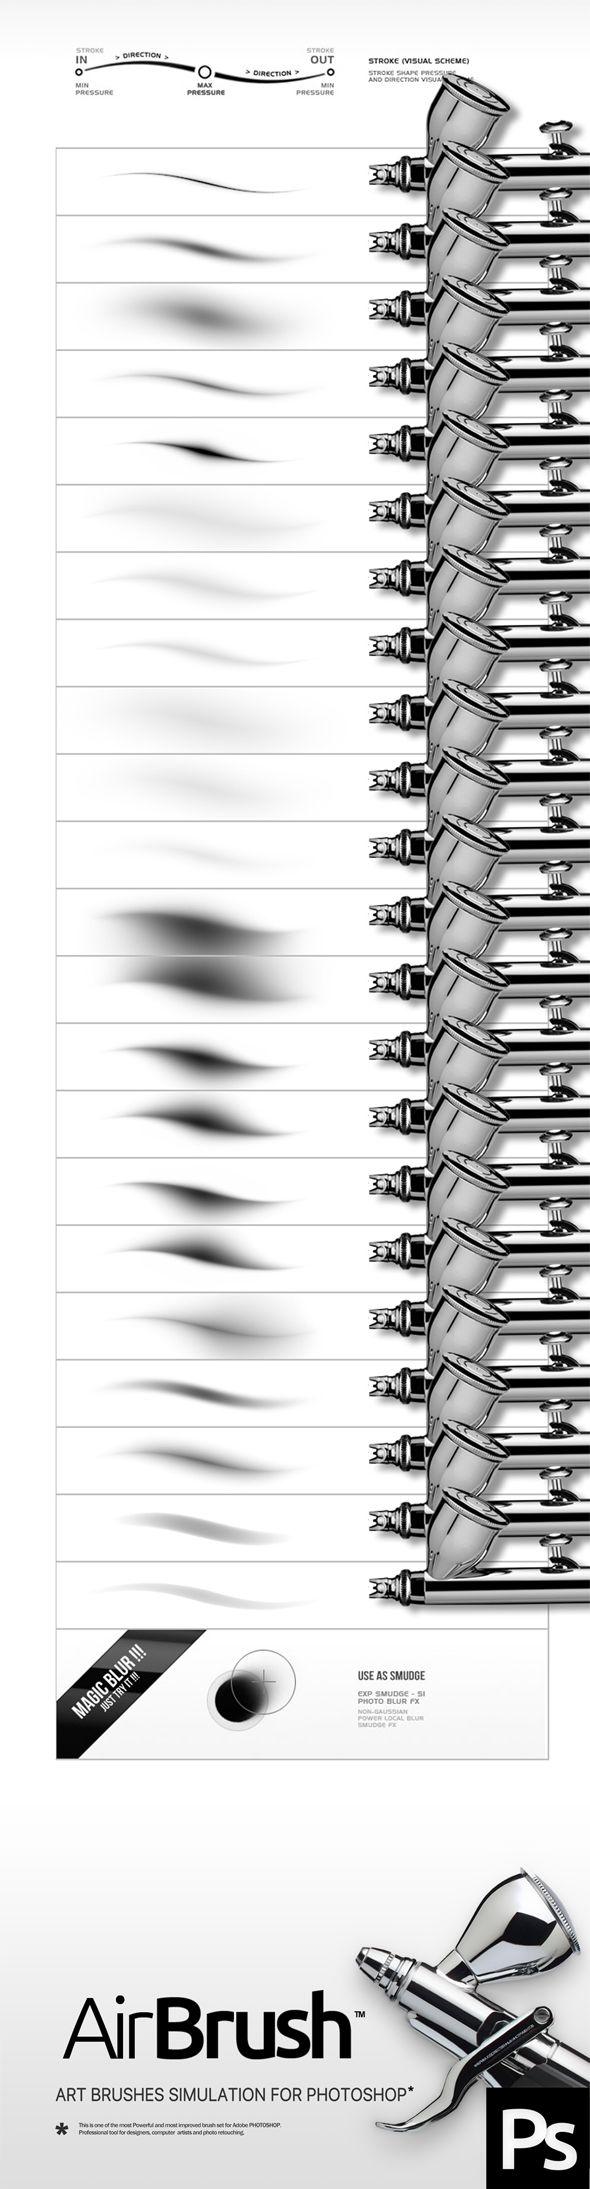 Airbrush Photoshop Brushes. Download here: http://graphicriver.net/item/airbrush-brushes/15815667?ref=ksioks